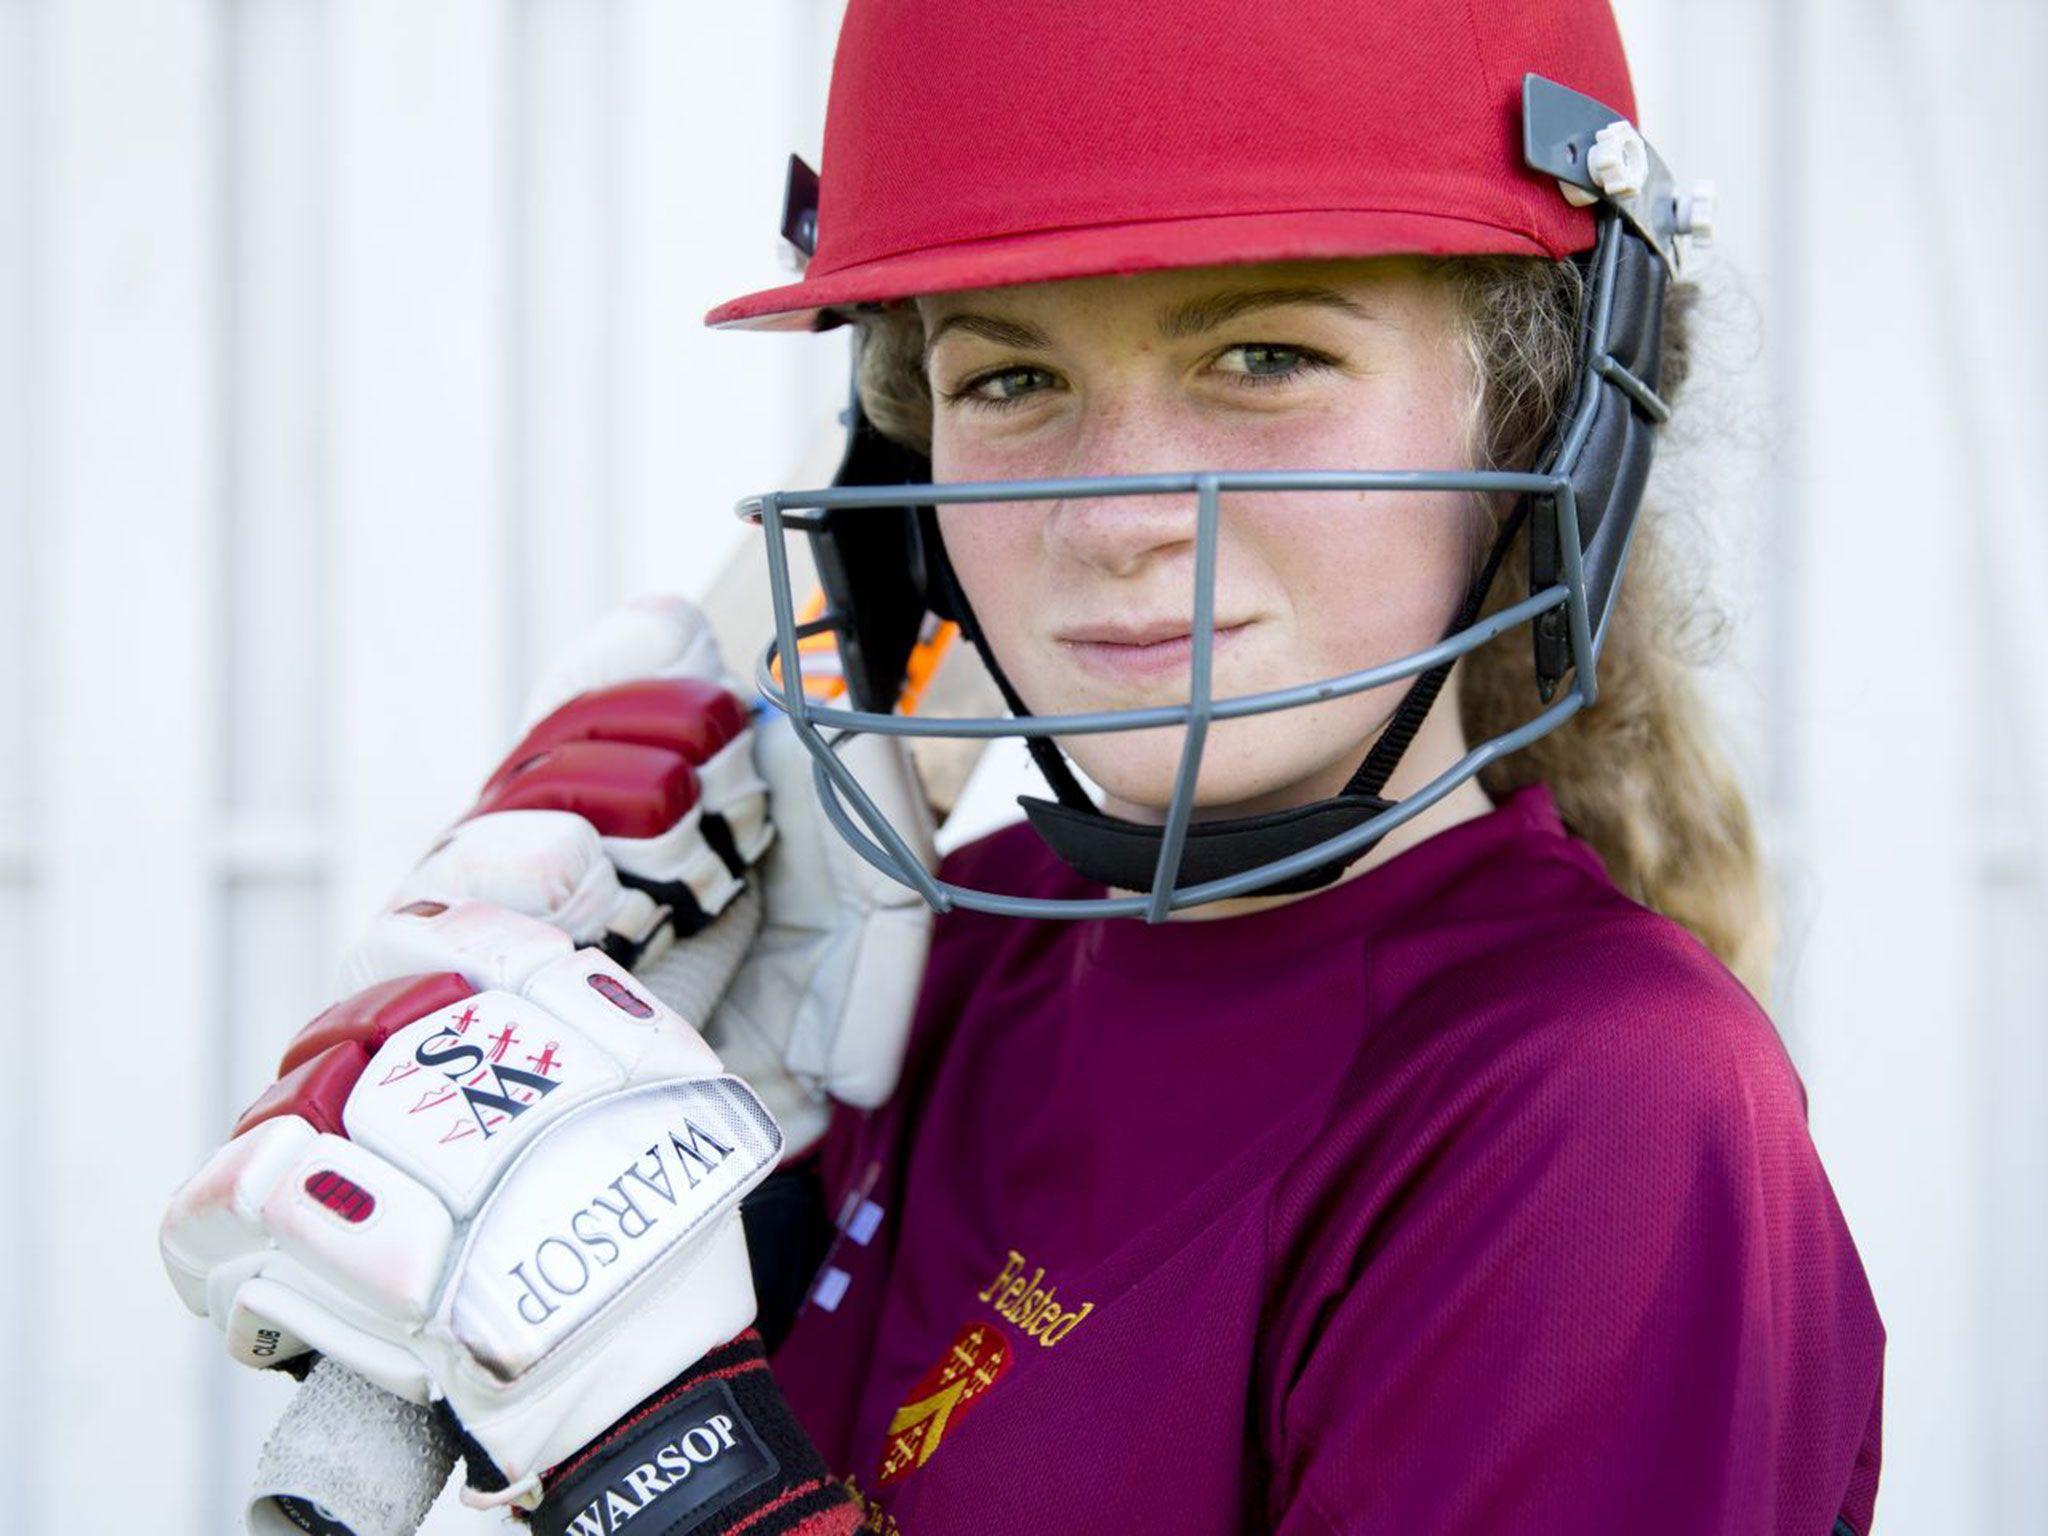 Success of the England women's cricket team inspires girls